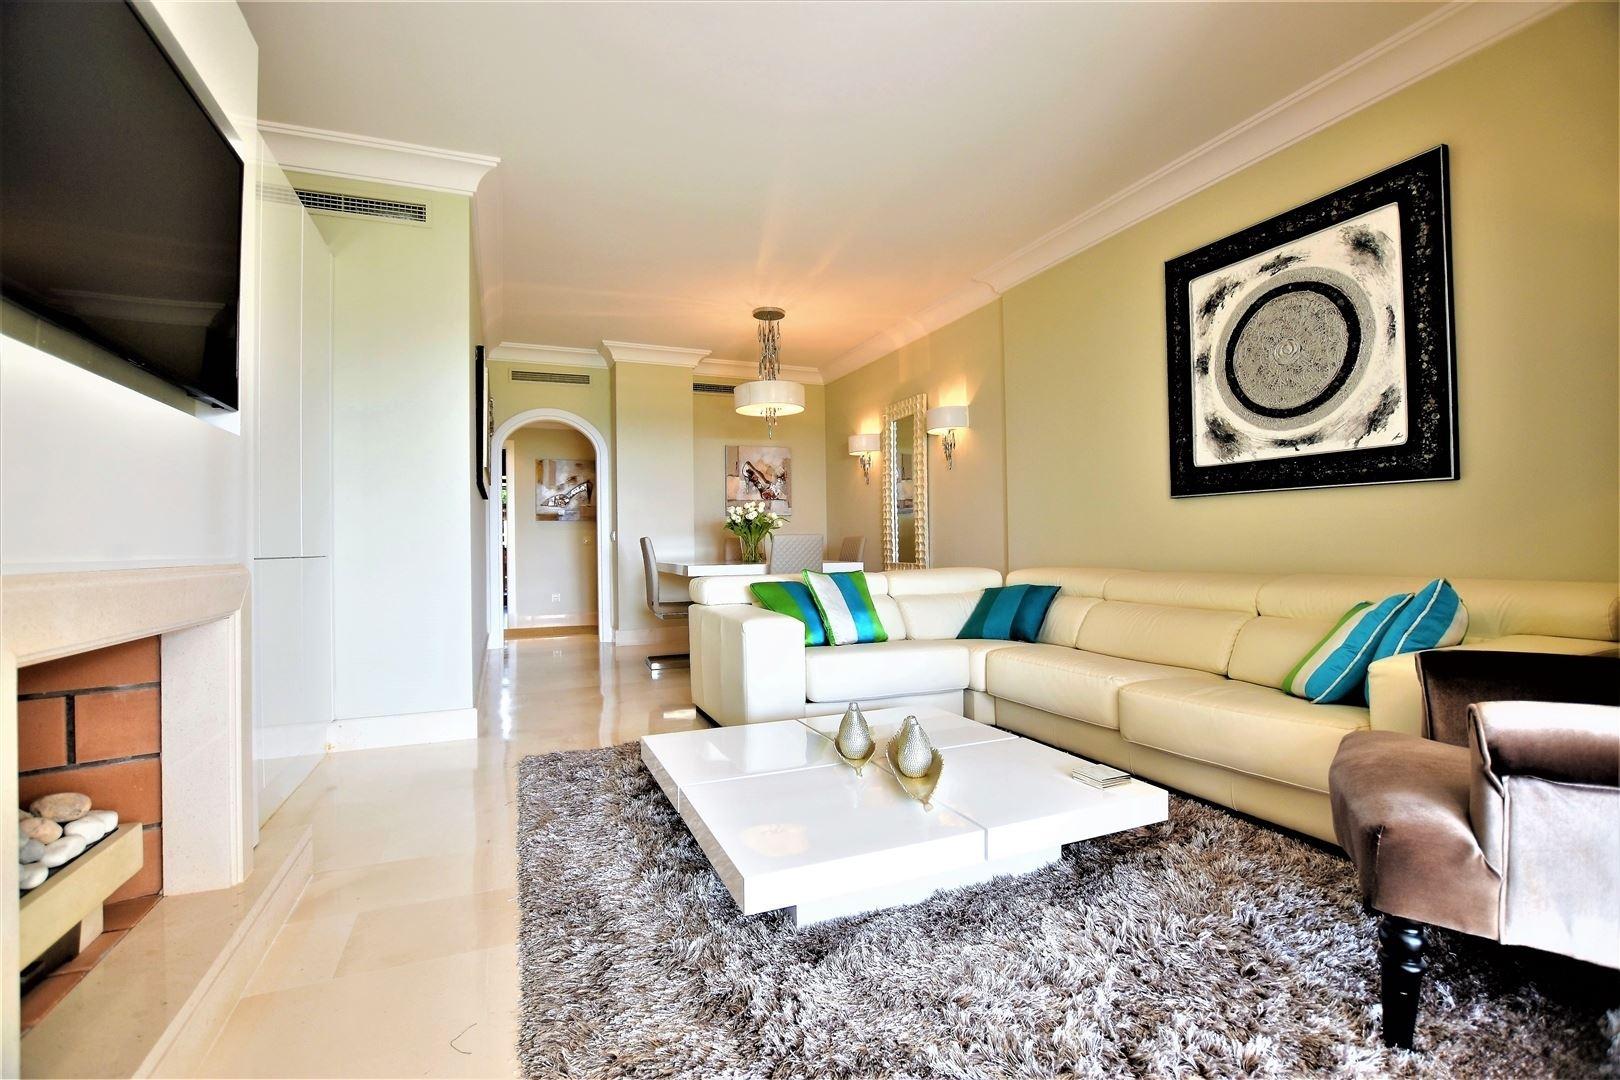 Foto 5 : Appartement te 29679 MARBELLA (Spanje) - Prijs € 1.750